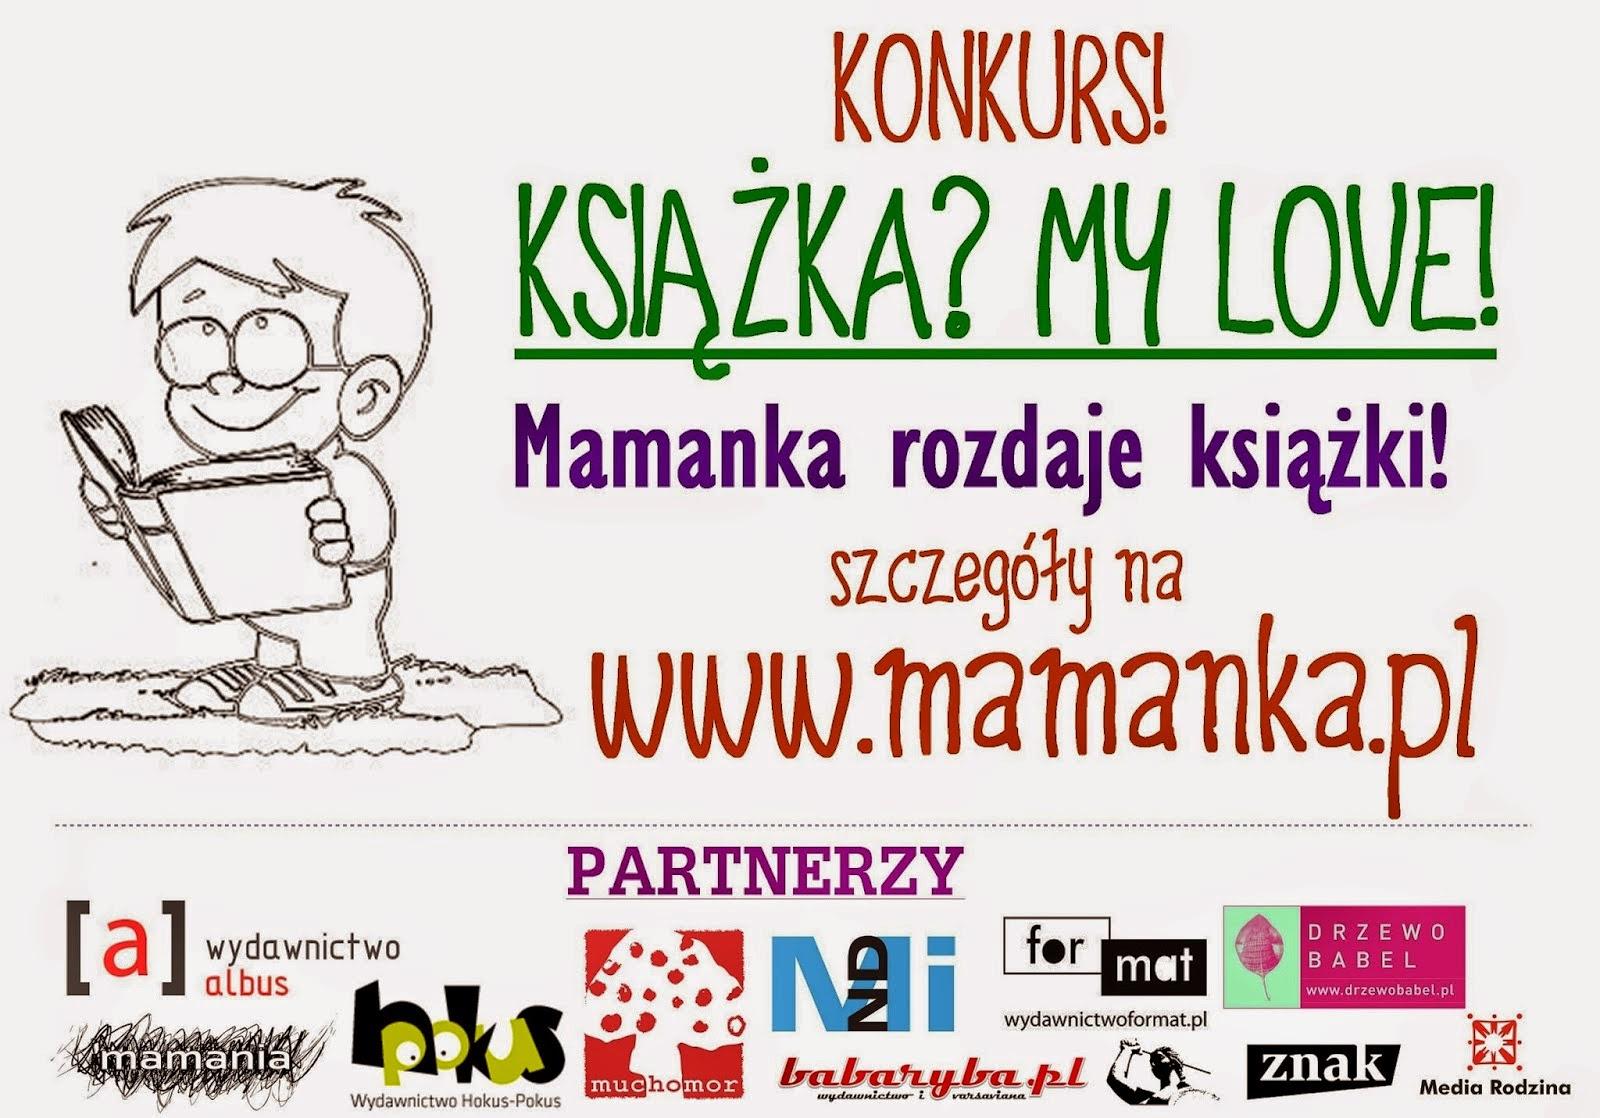 http://www.mamanka.pl/2014/04/ksiazka-my-love-konkurs.html